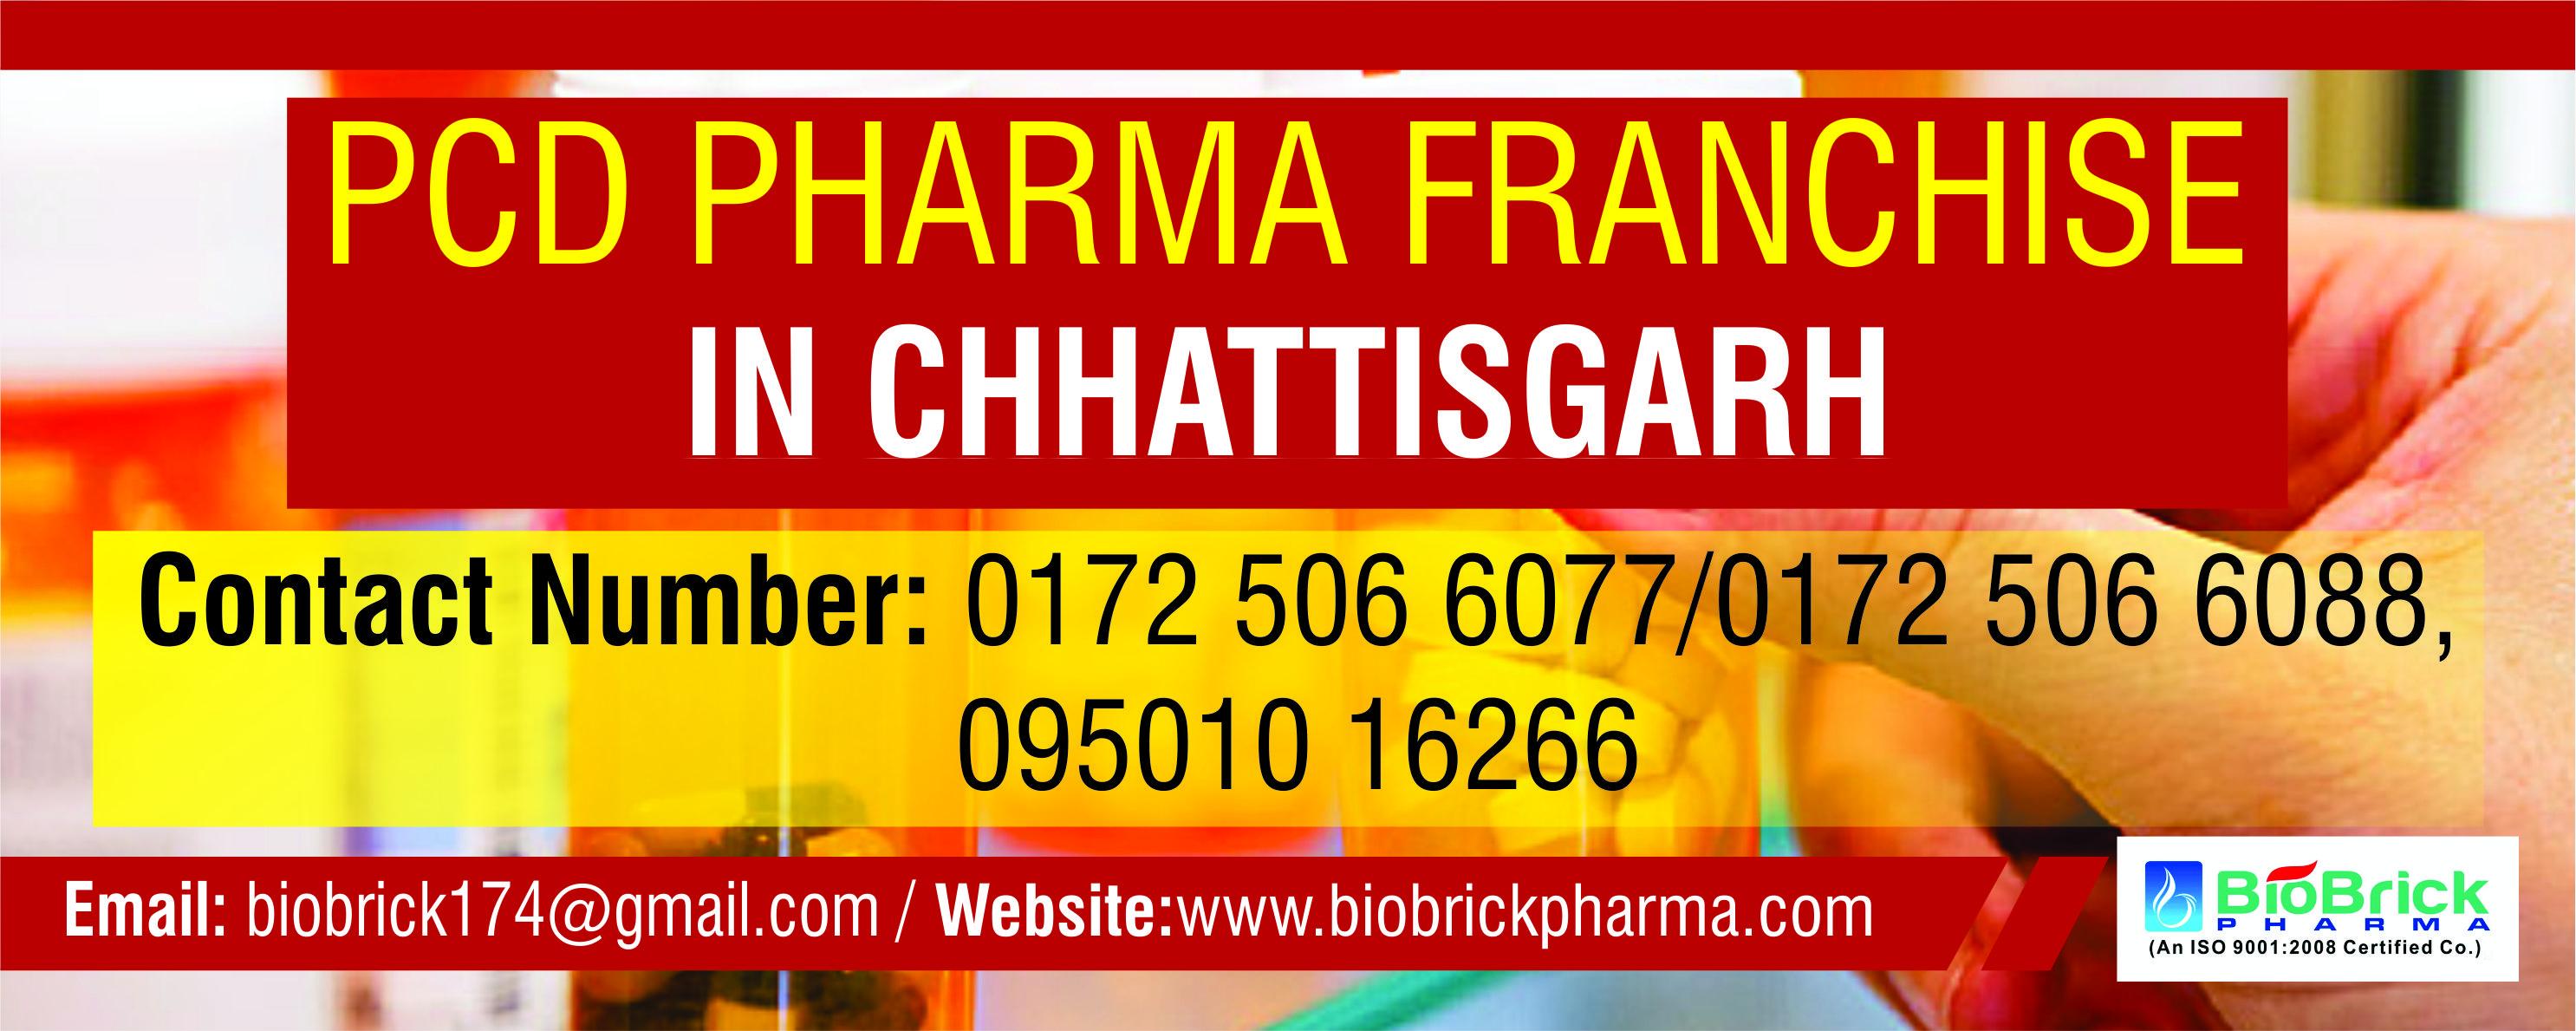 Top Pharma PCD Franchise company in Chhattisgarh